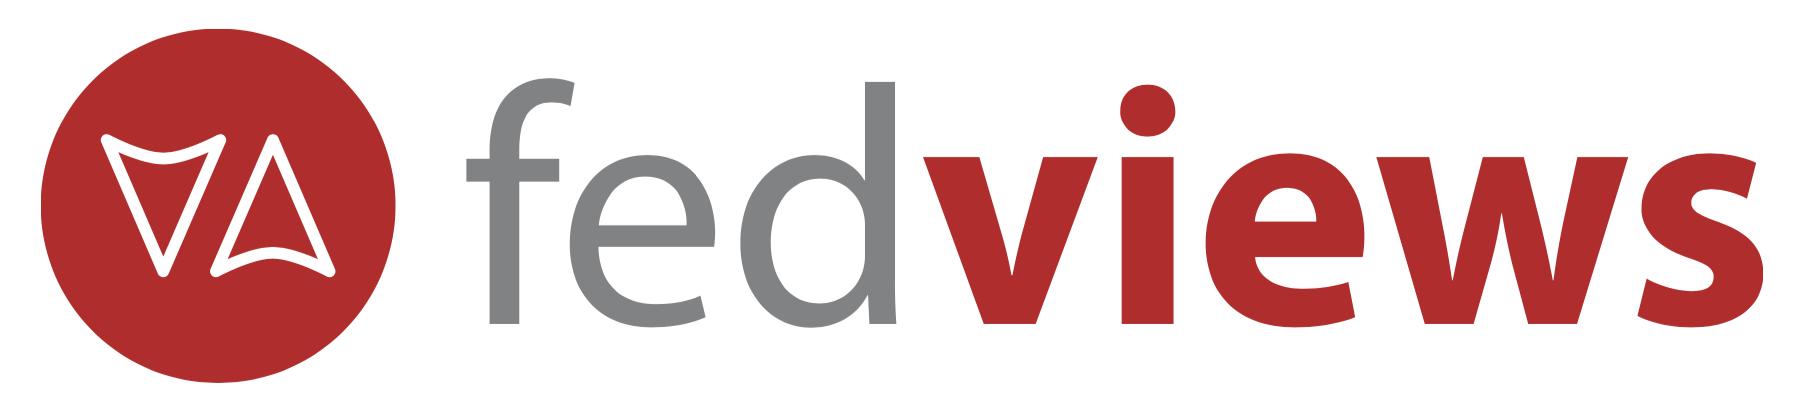 FedViews-HorizontalLogo.png